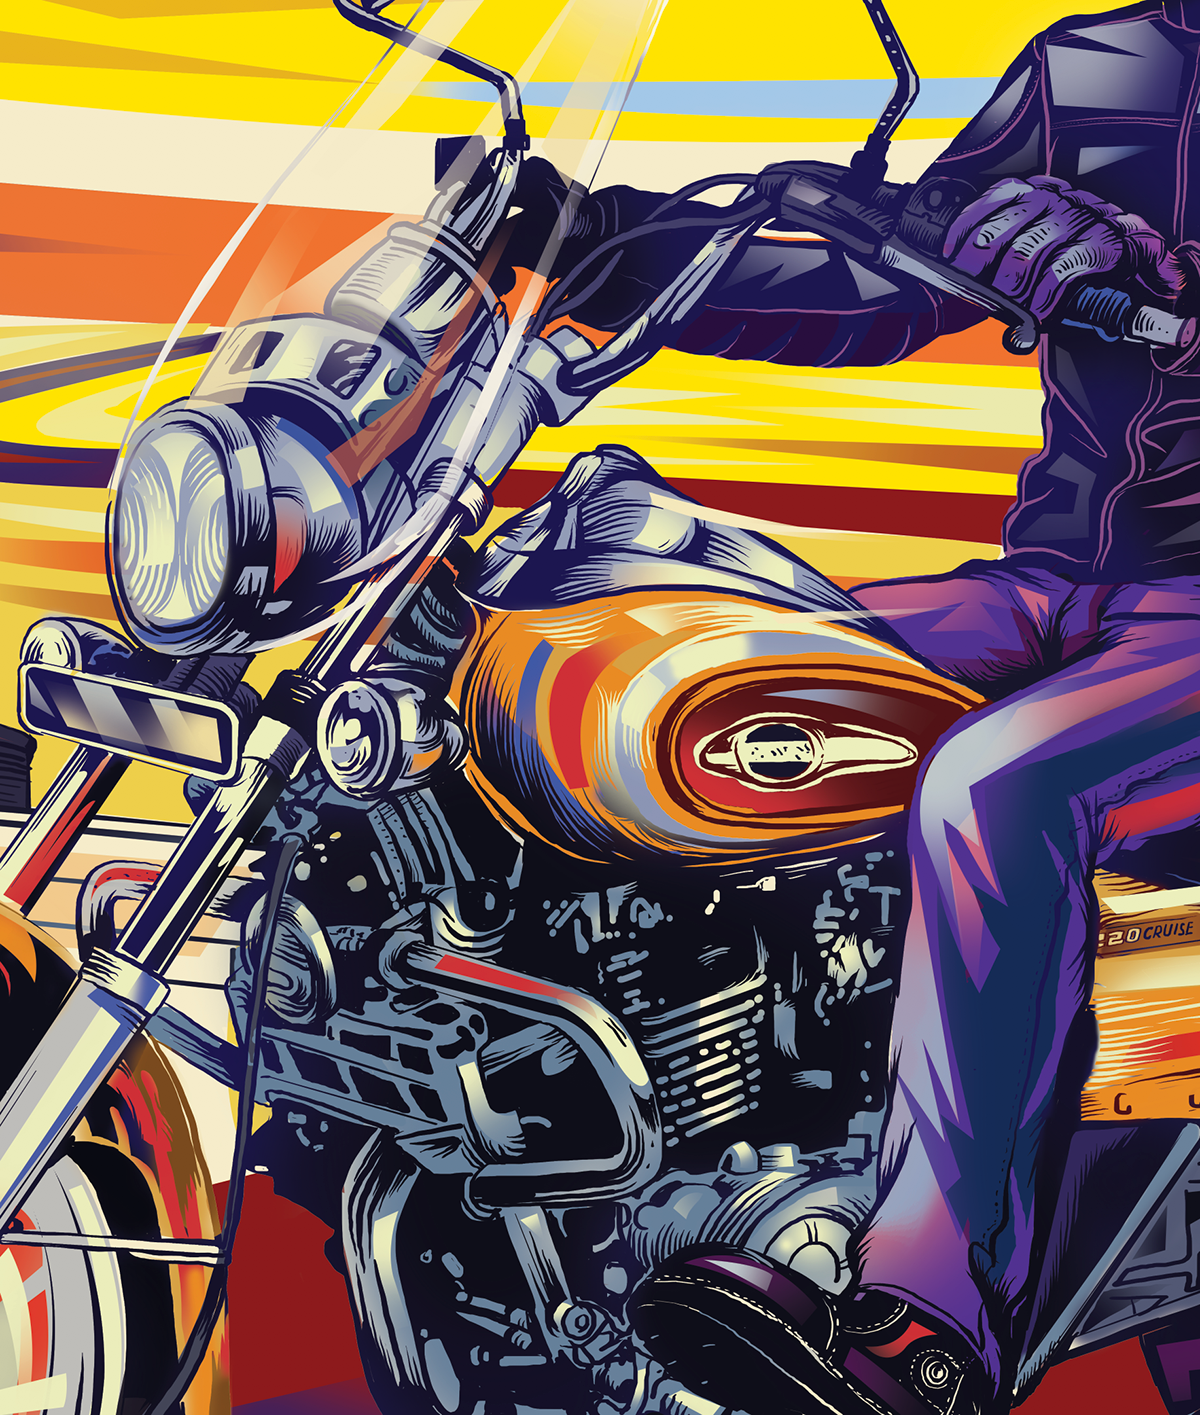 ILLUSTRATION  Digital Art  Bajaj Avenger conceptart Drawing